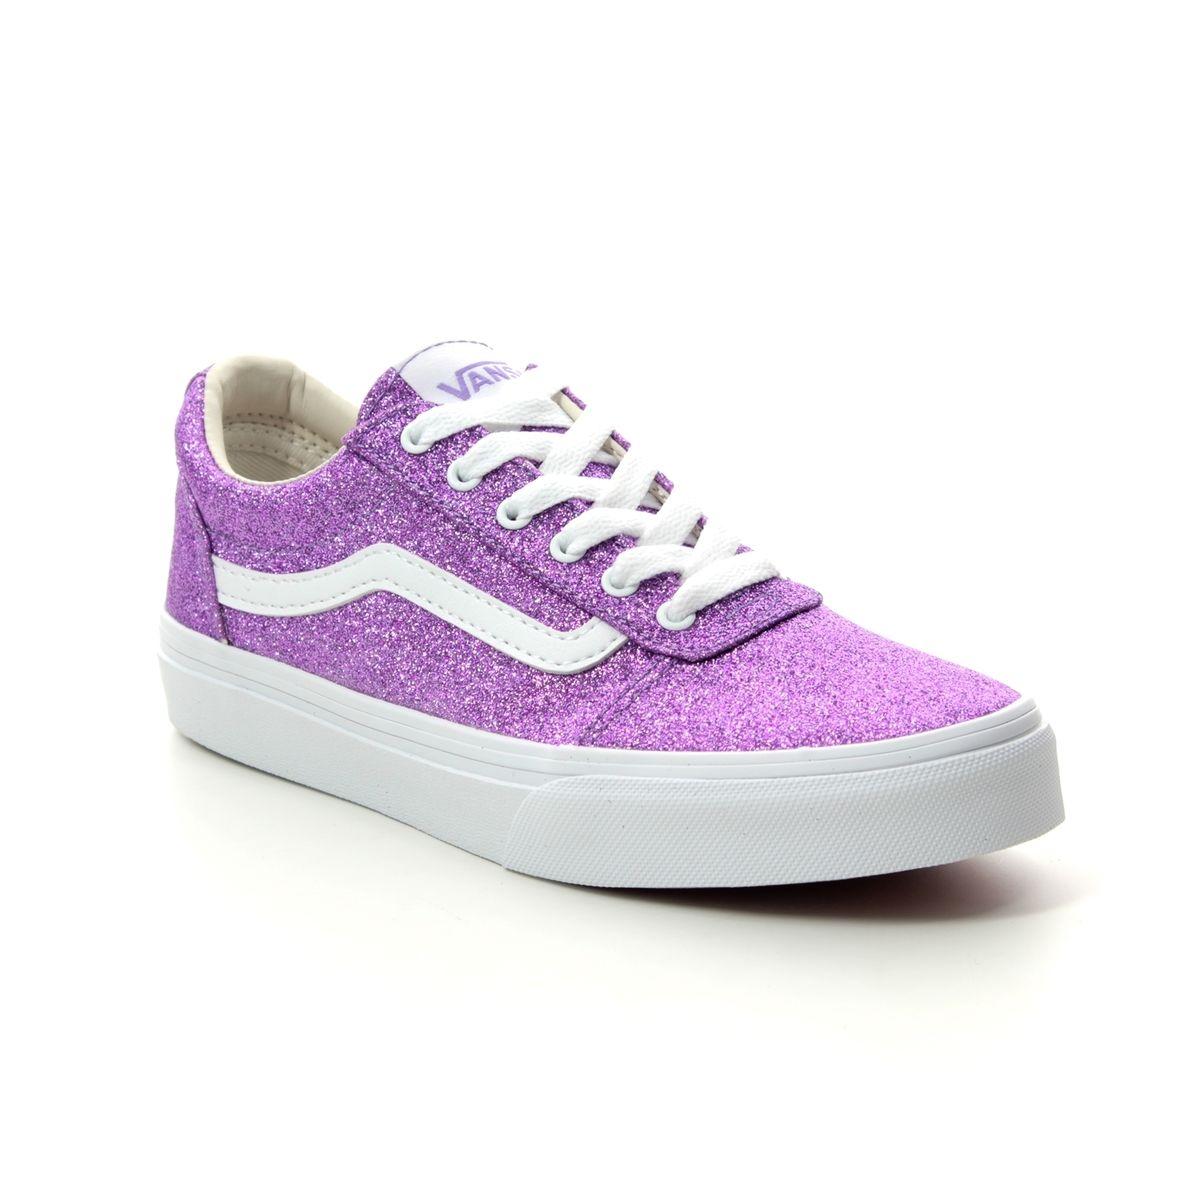 Vans Ward G VN0A3TFWV-2H1 Purple Glitz